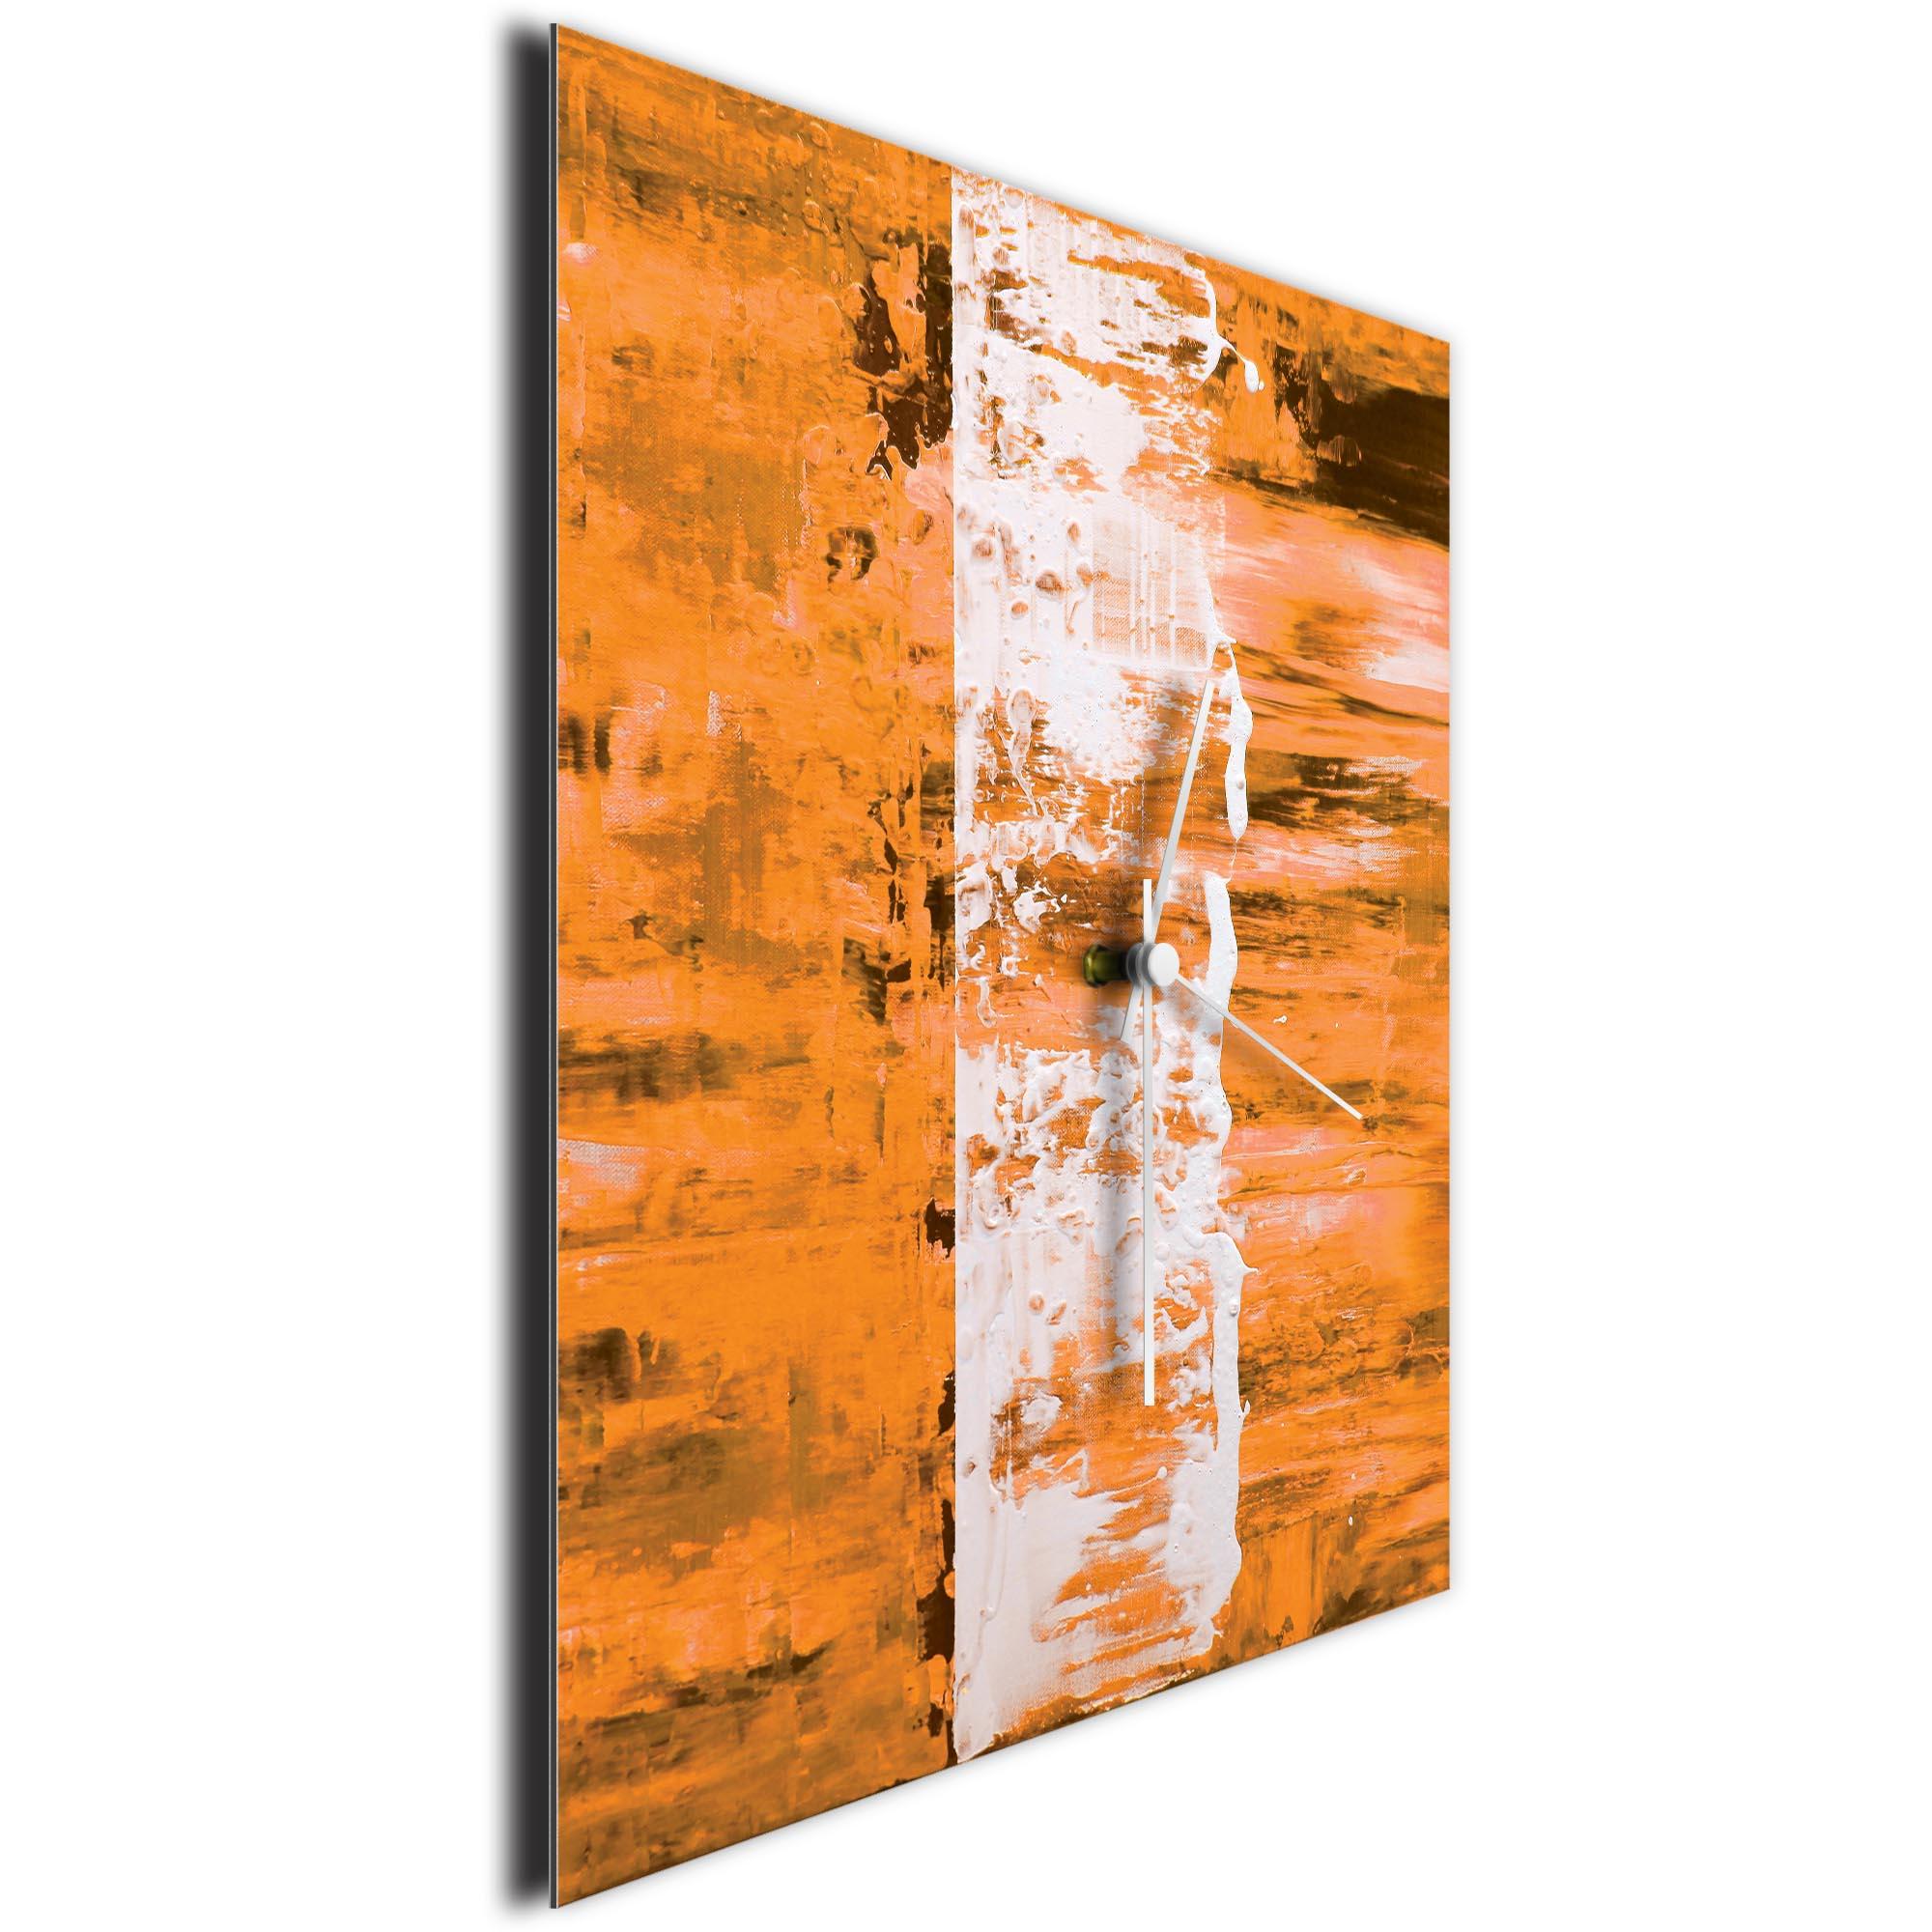 Orange Street Square Clock by Mendo Vasilevski - Urban Abstract Home Decor - Image 3